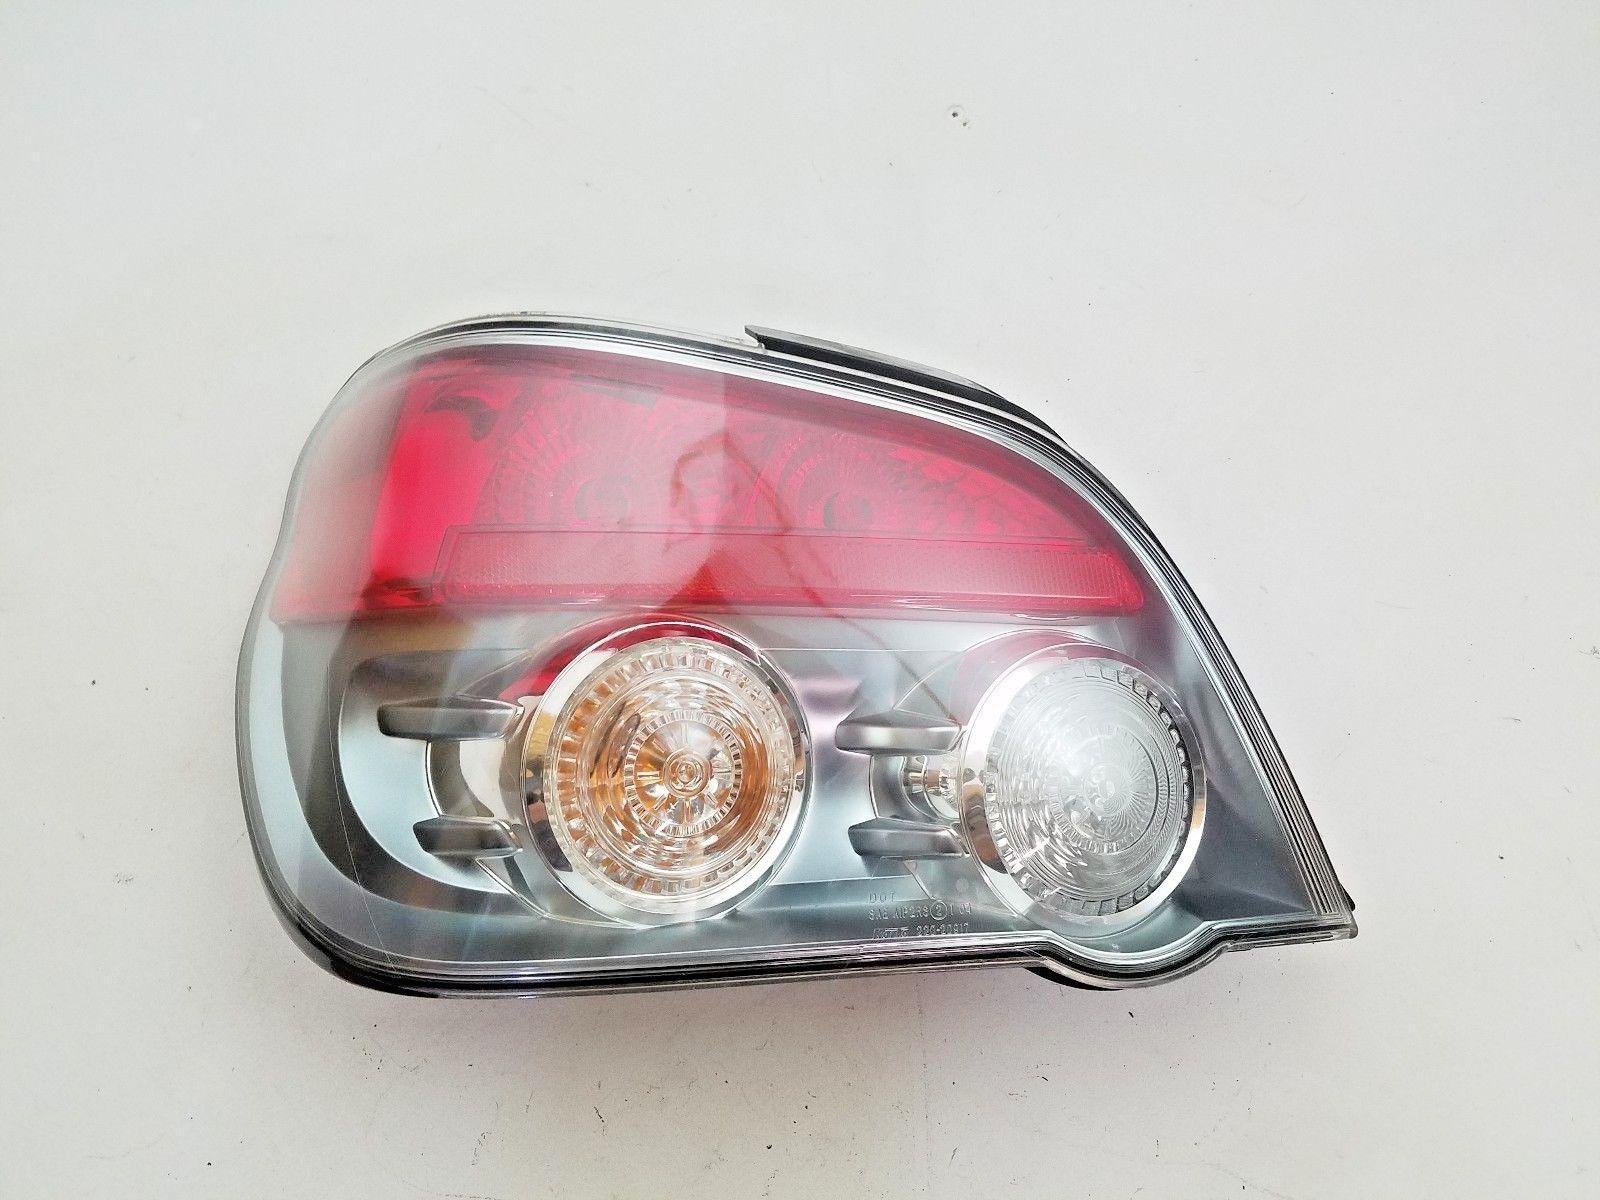 Amazing Subaru Impreza Wrx Sti Sedan Tail Light Taillight Driver S Left 2006 2007 2018 2019